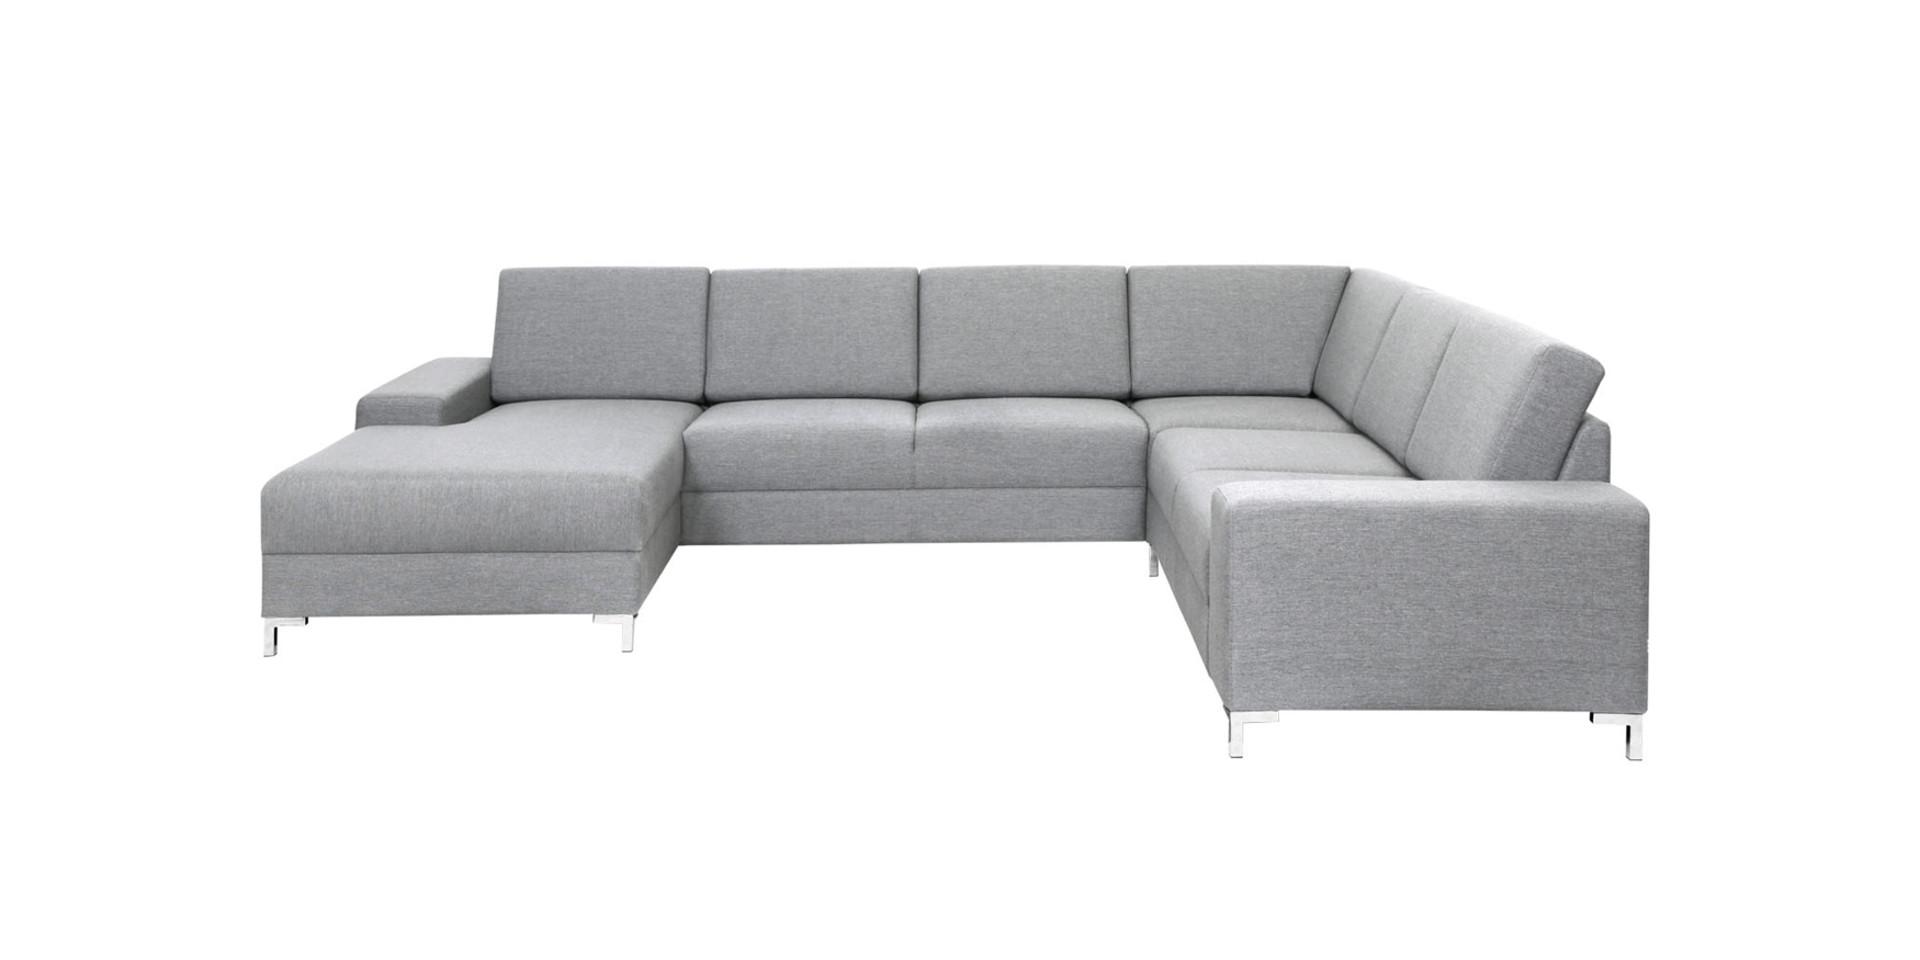 sits-anton-angle-set1_cavani18719_light_grey_1